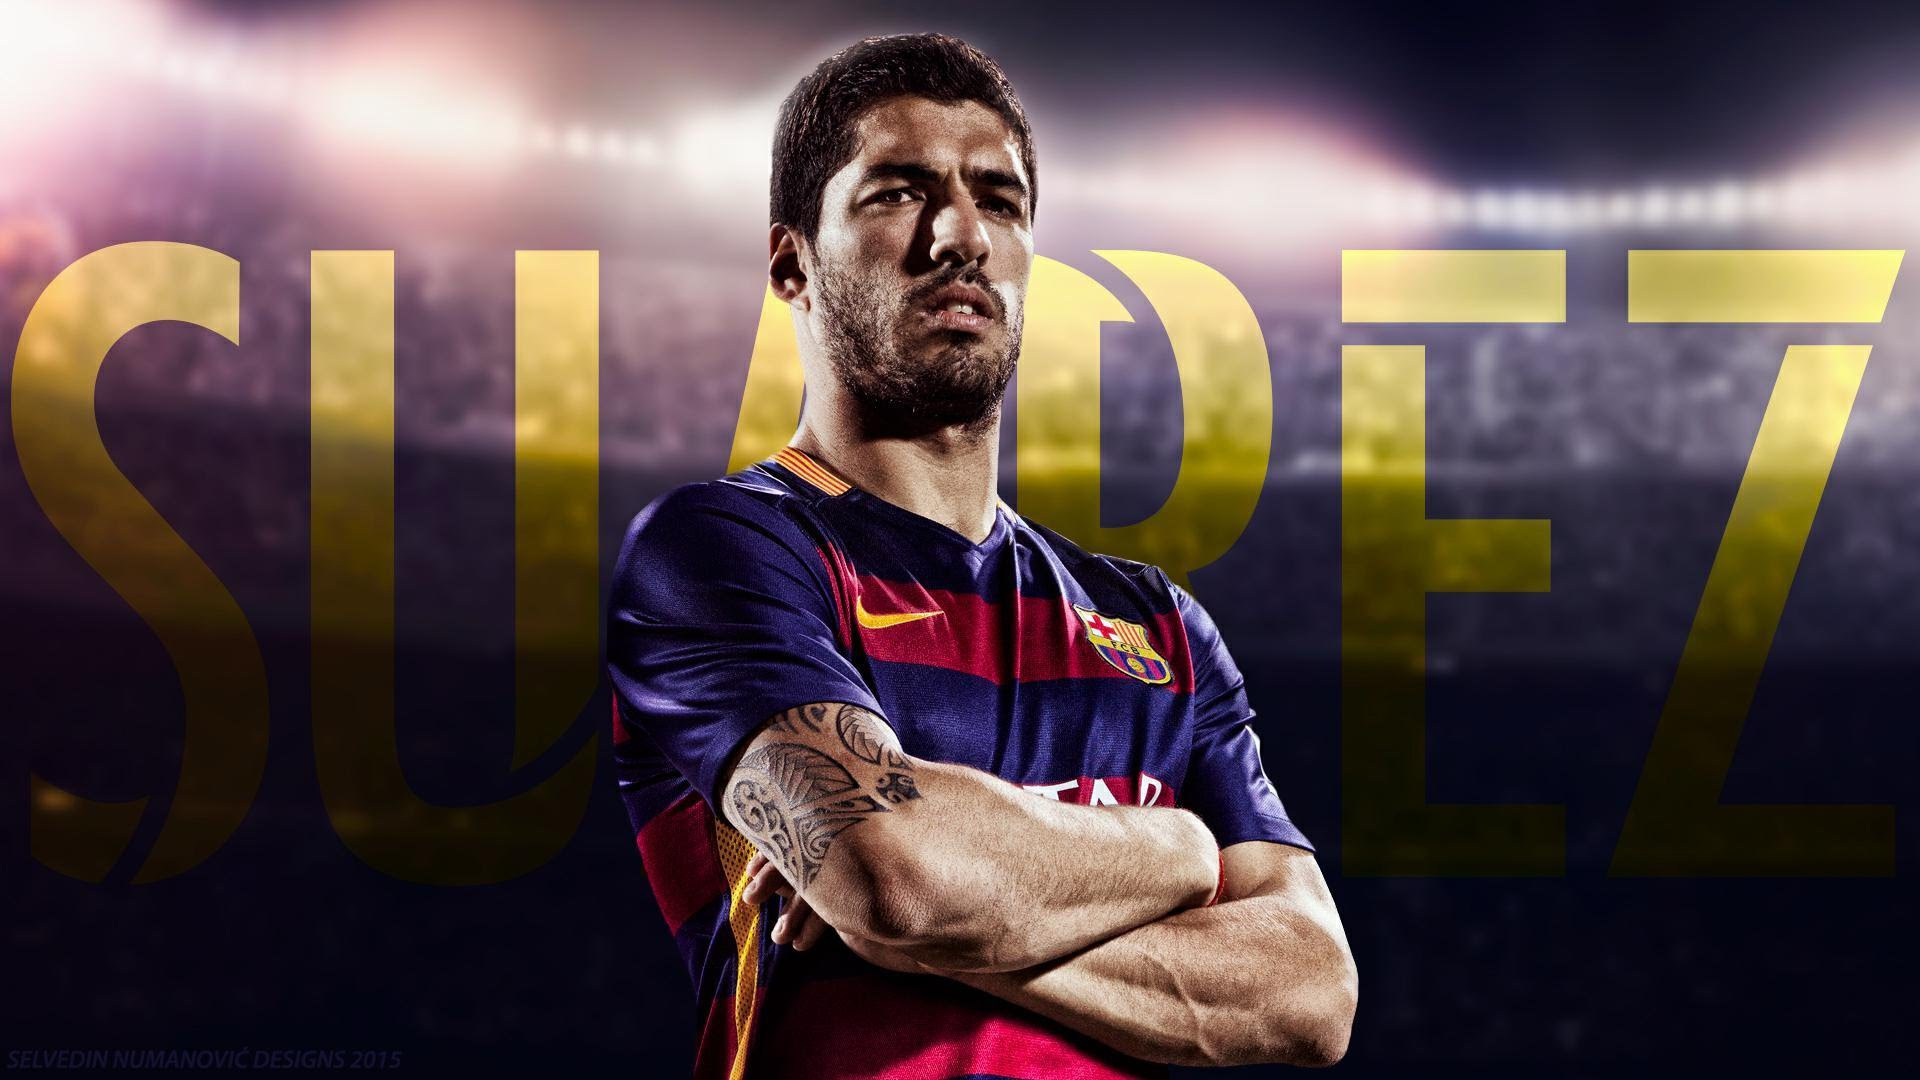 Luis Suarez Background